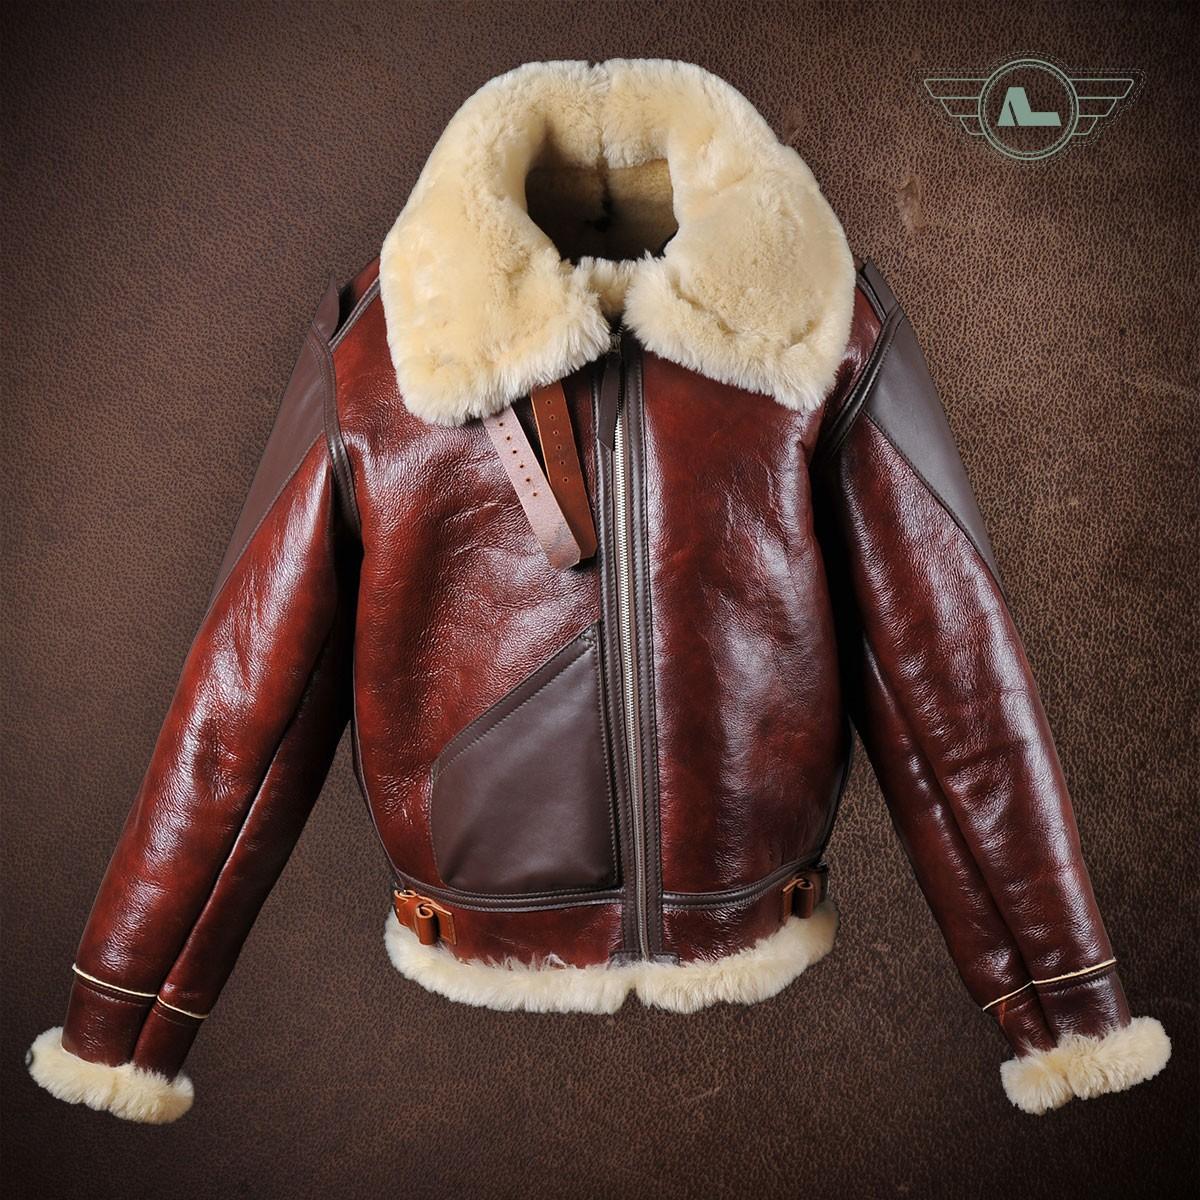 Redskin shearling flight jacket